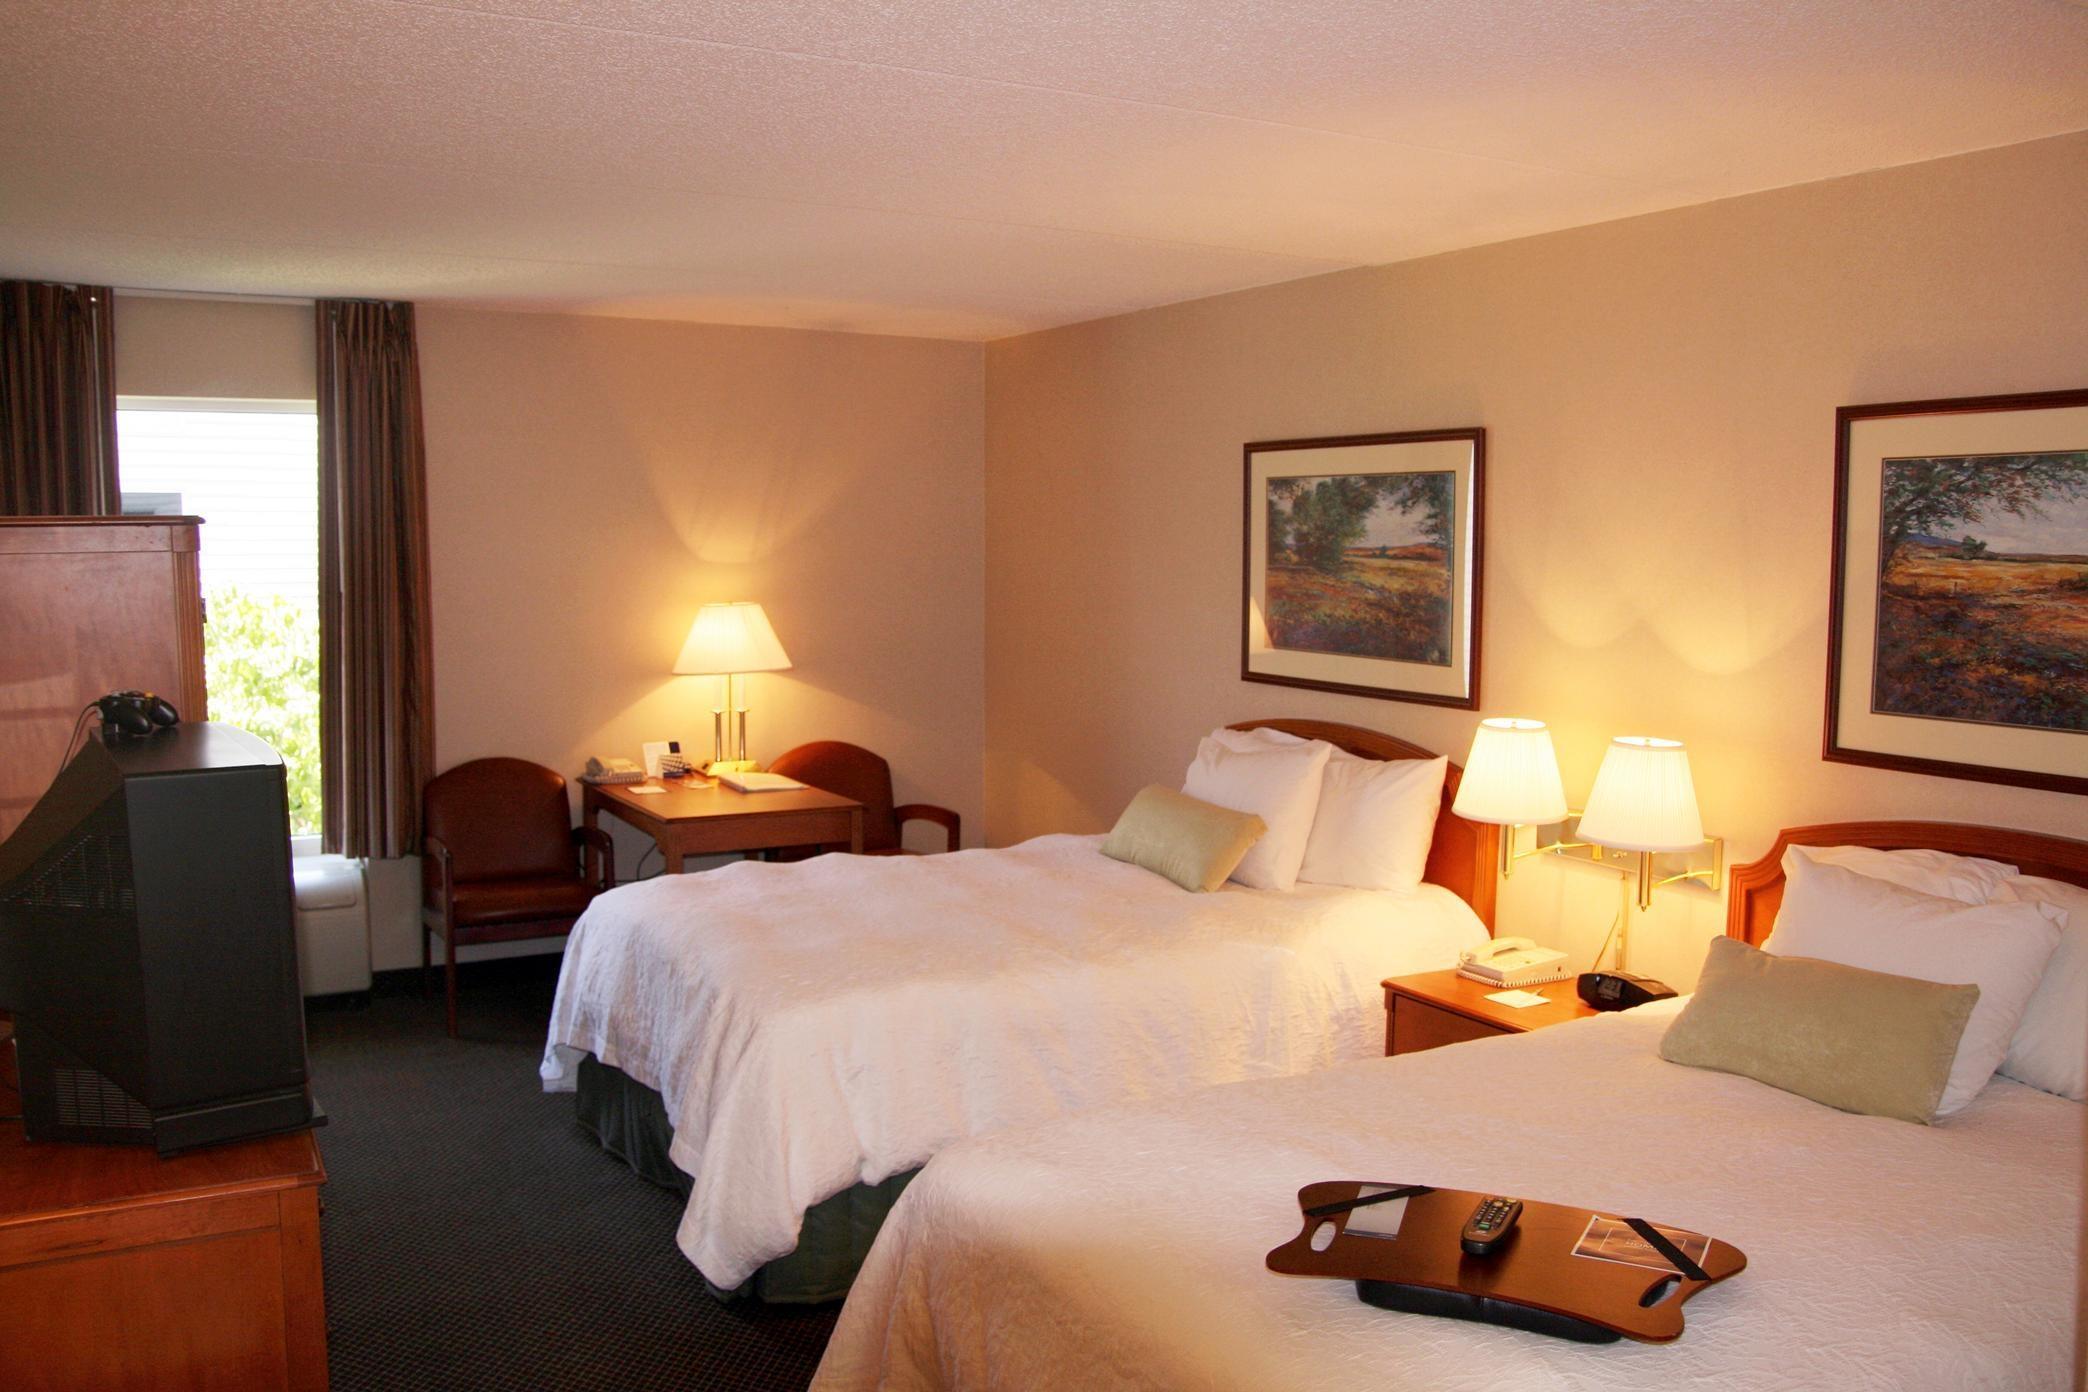 Hampton Inn & Suites Newtown image 14